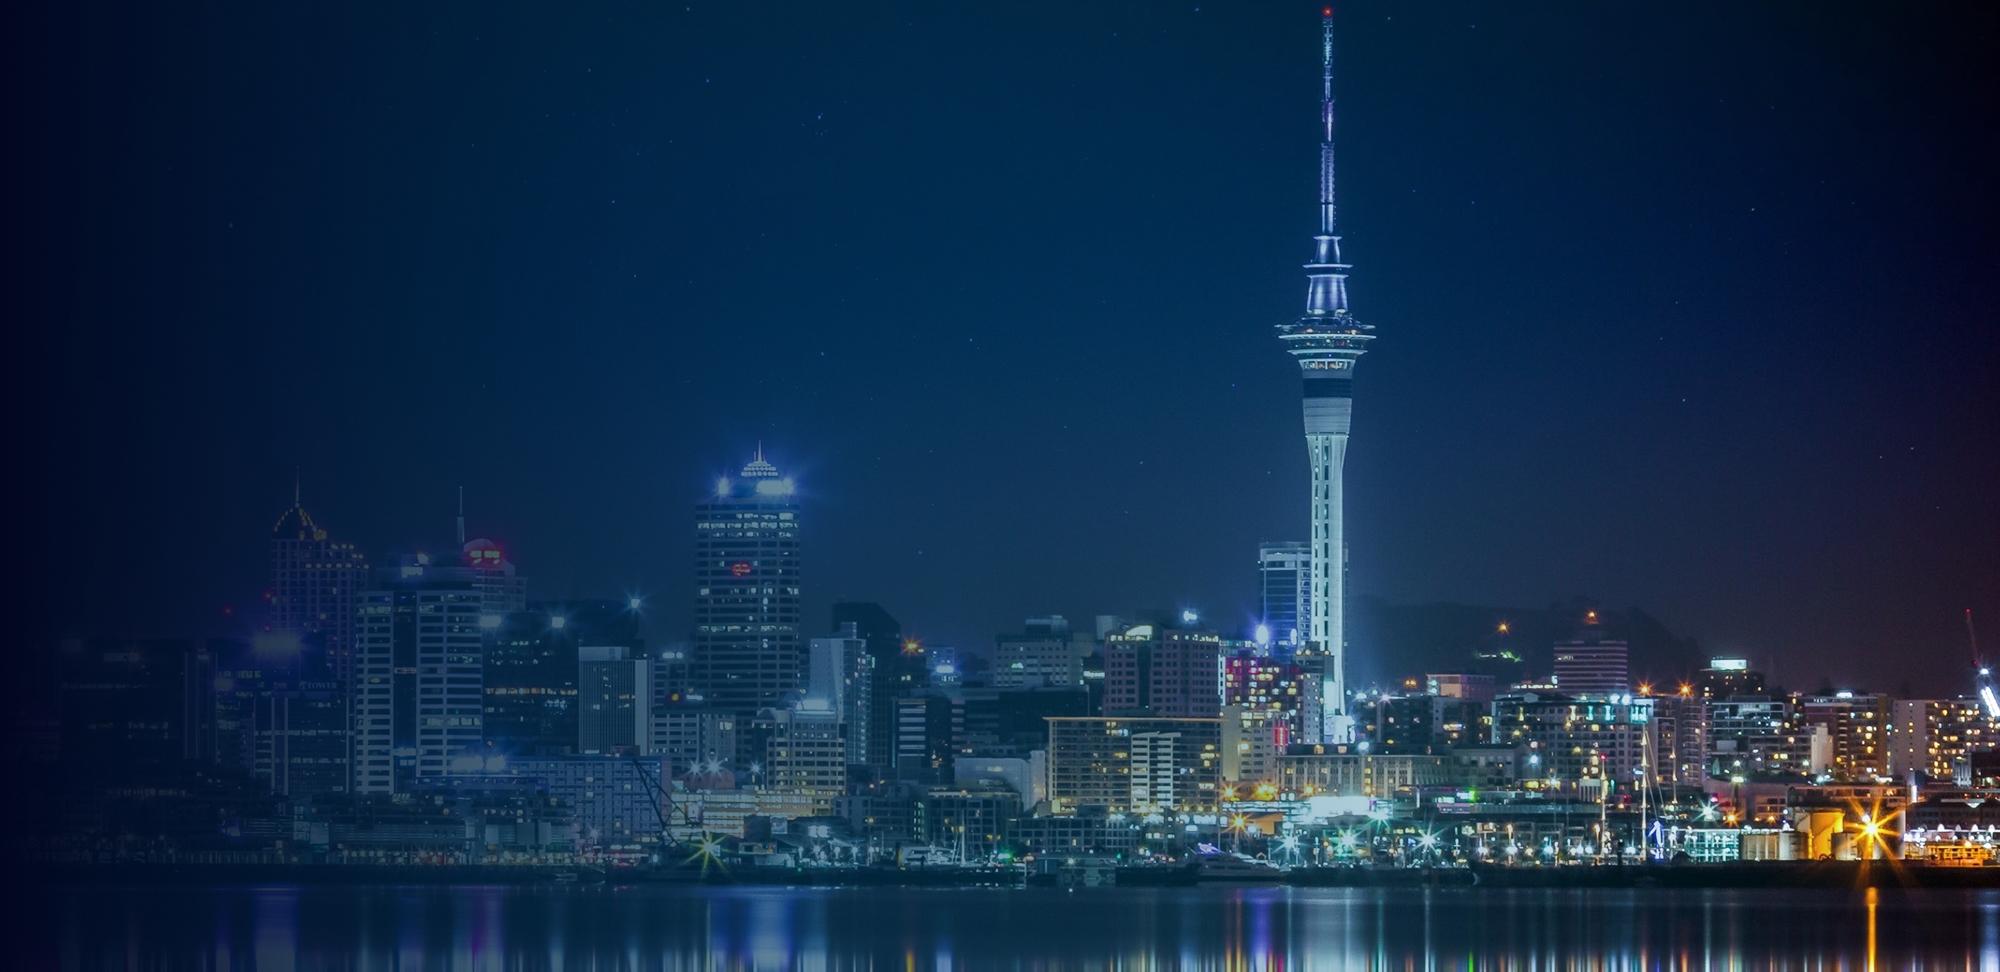 Auckland night cityscape